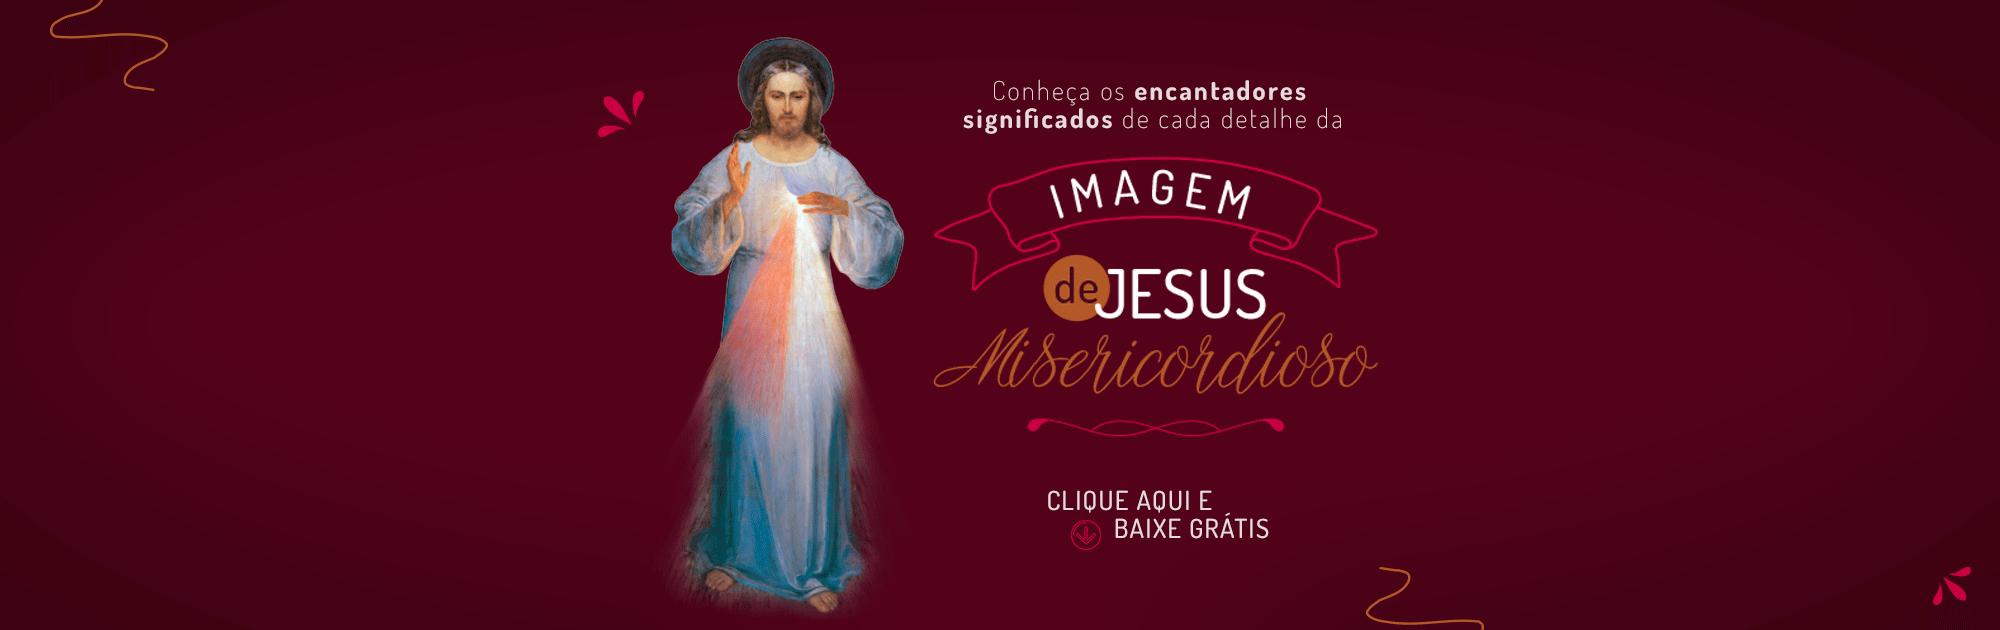 Banner-Blog-Imagem-de-Jesus-Misericordioso-Santuário-Divina-Misericórdia-CuritibaPR